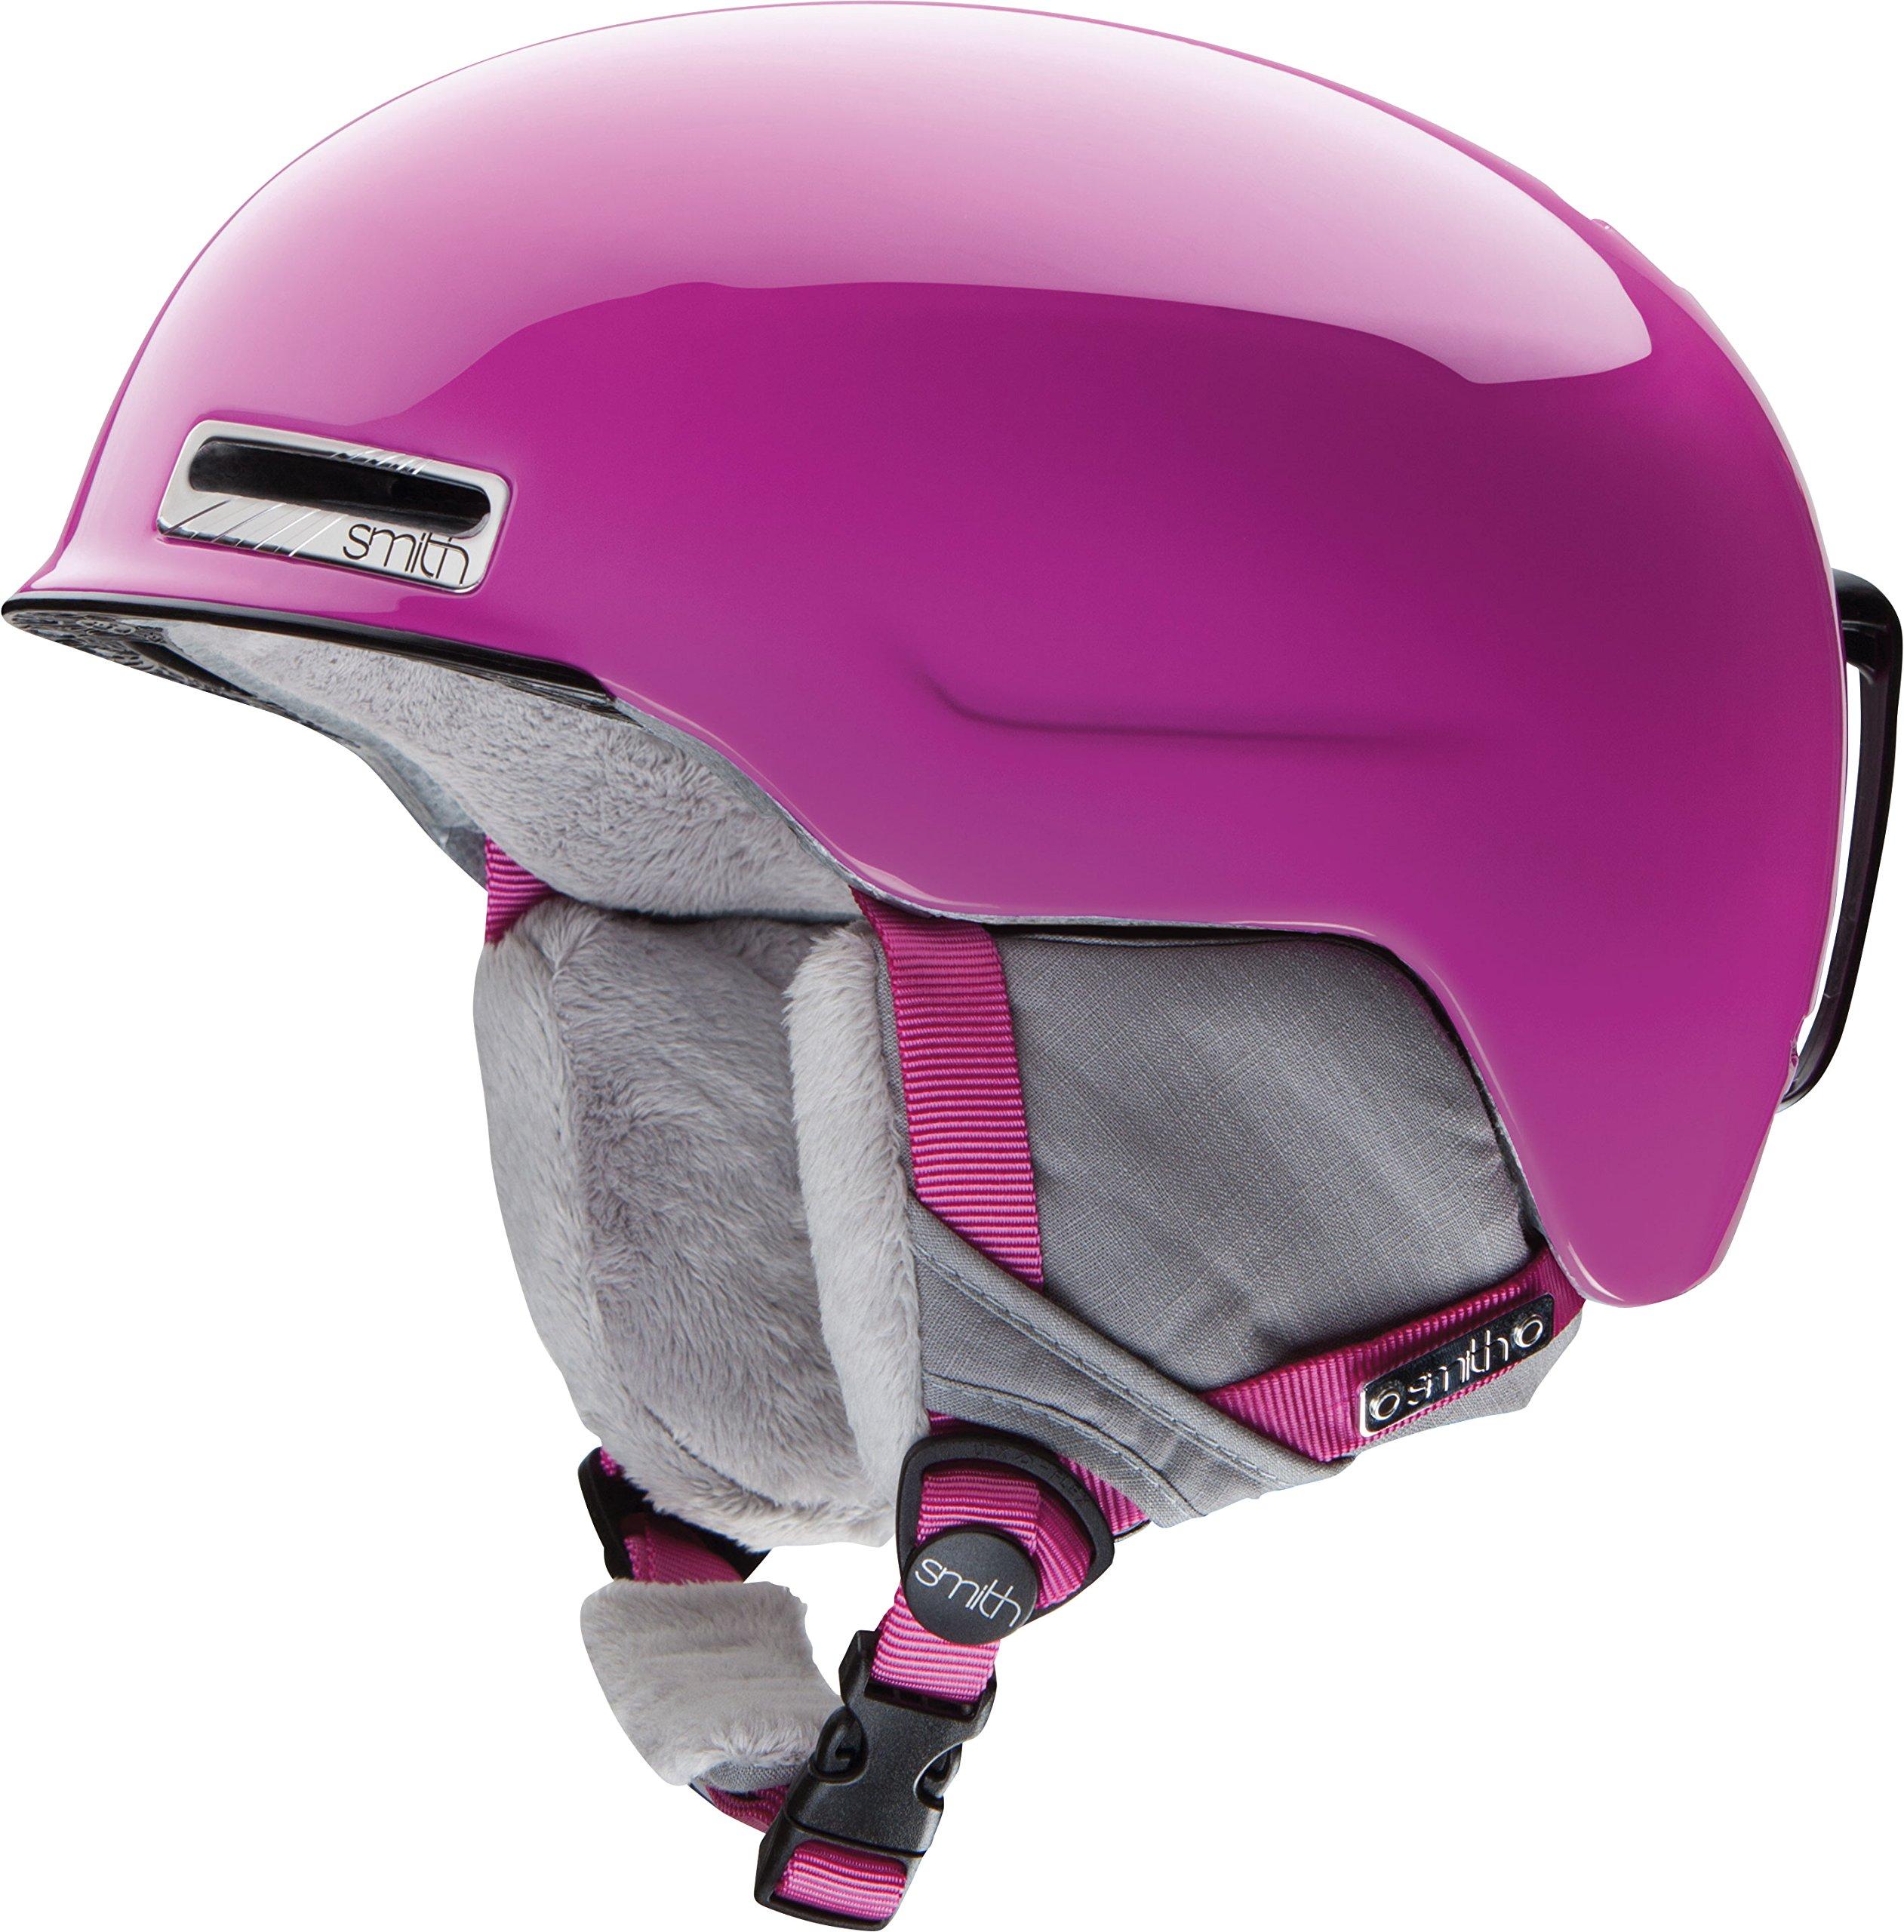 Smith Optics 2015 Women's Allure Winter Snow Helmet (Magenta - L 59-63CM)